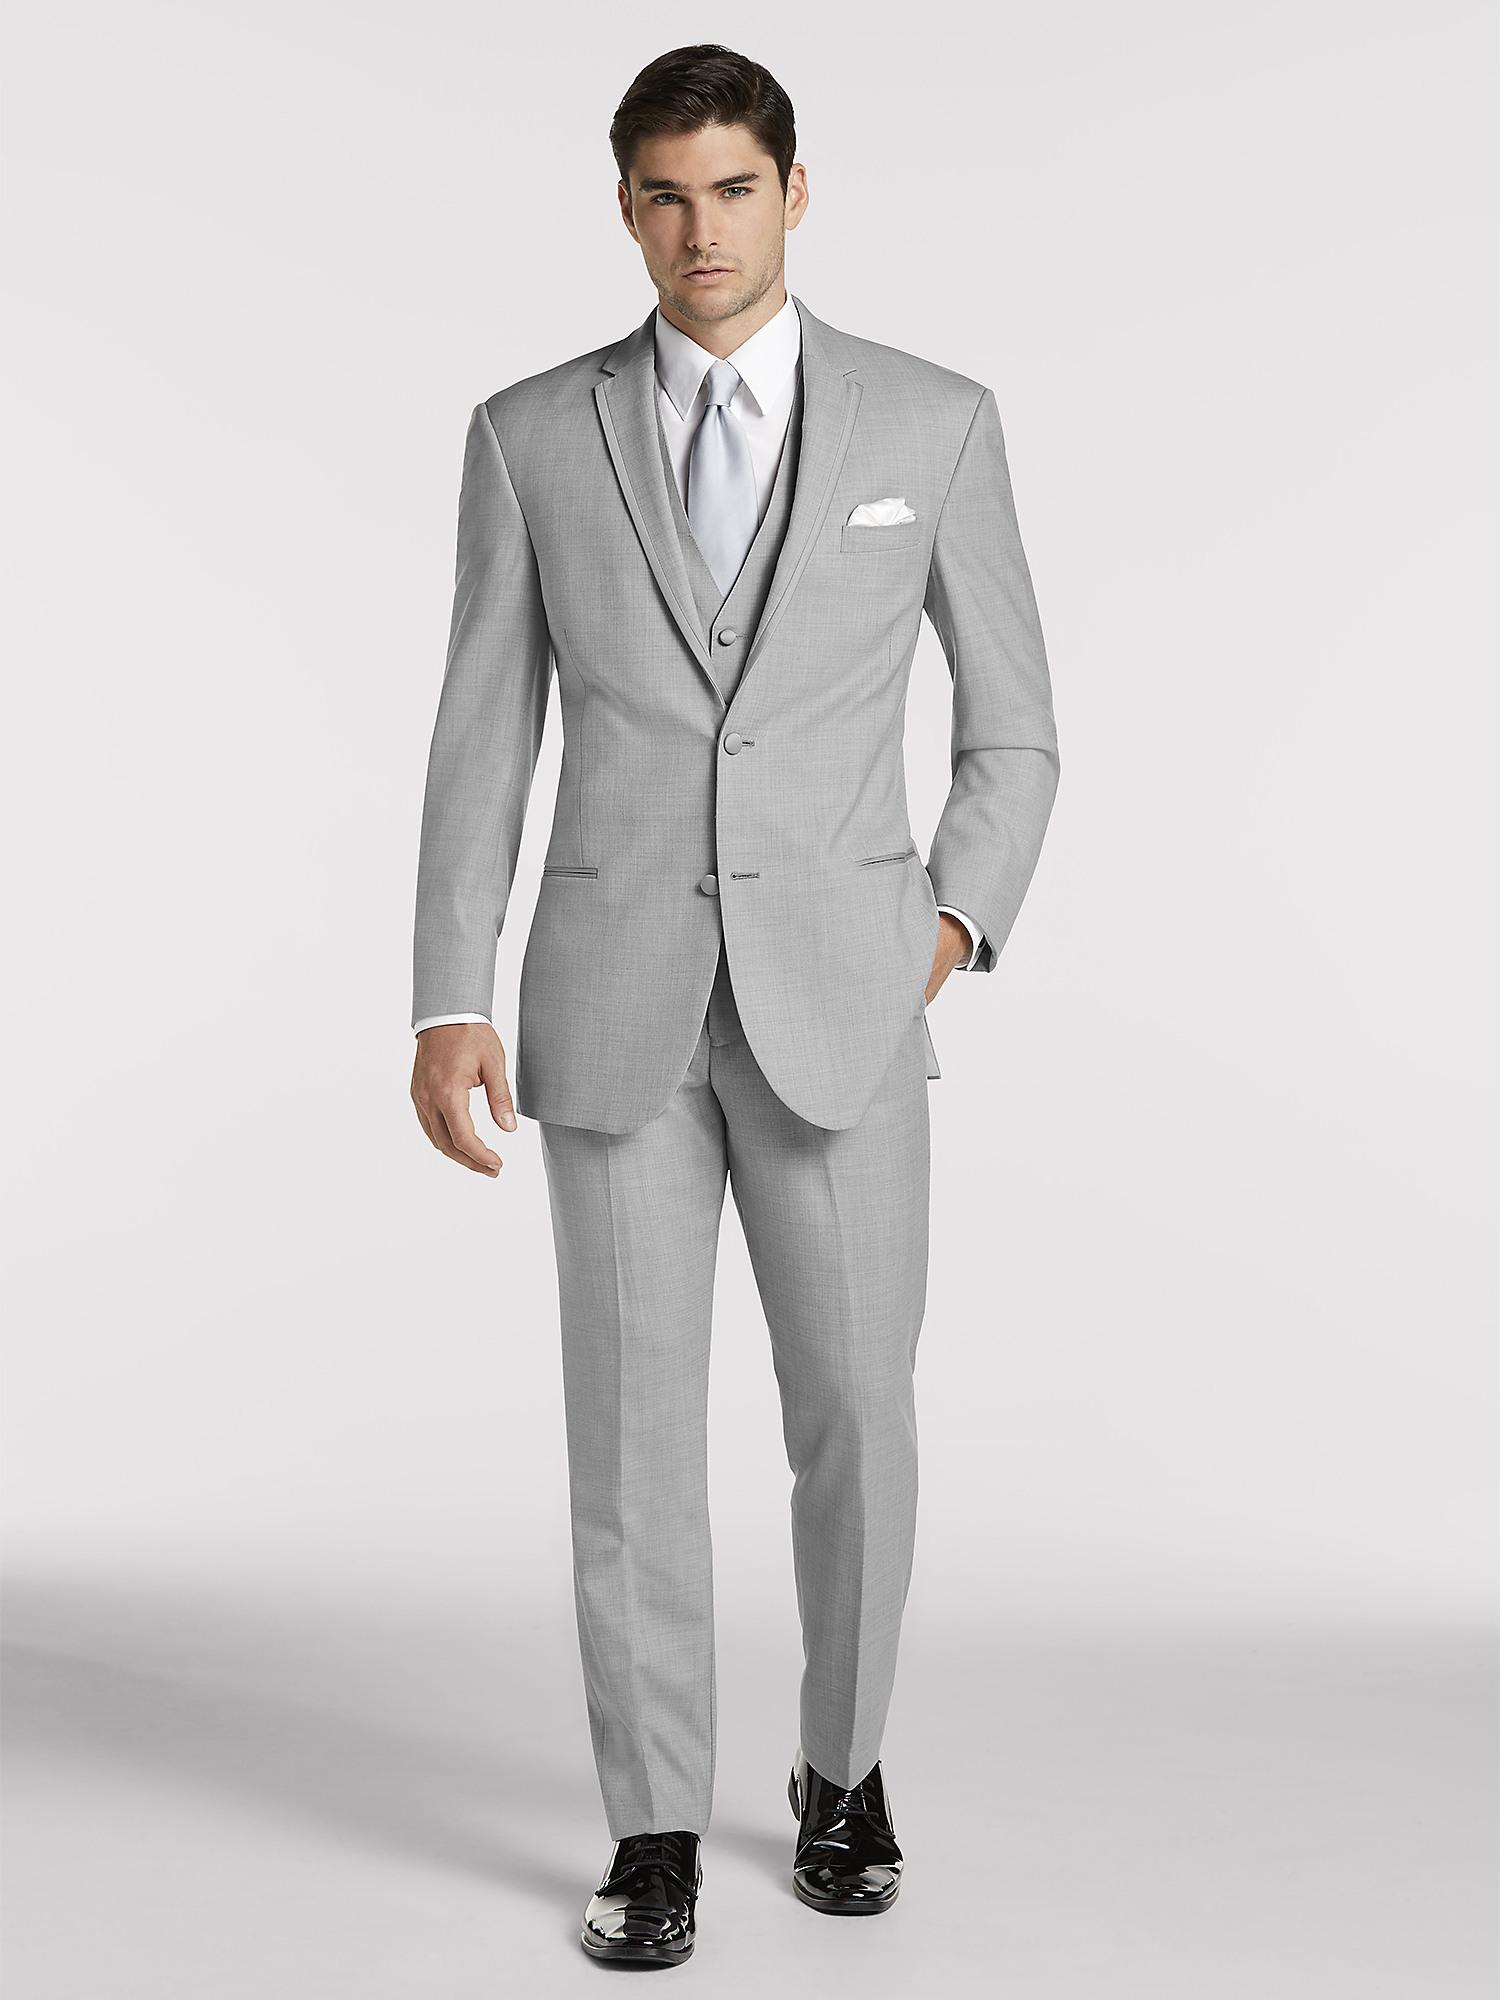 f40ca588c3a Light Grey Tuxedo by Joseph Abboud | Tuxedo Rental | Moores Clothing